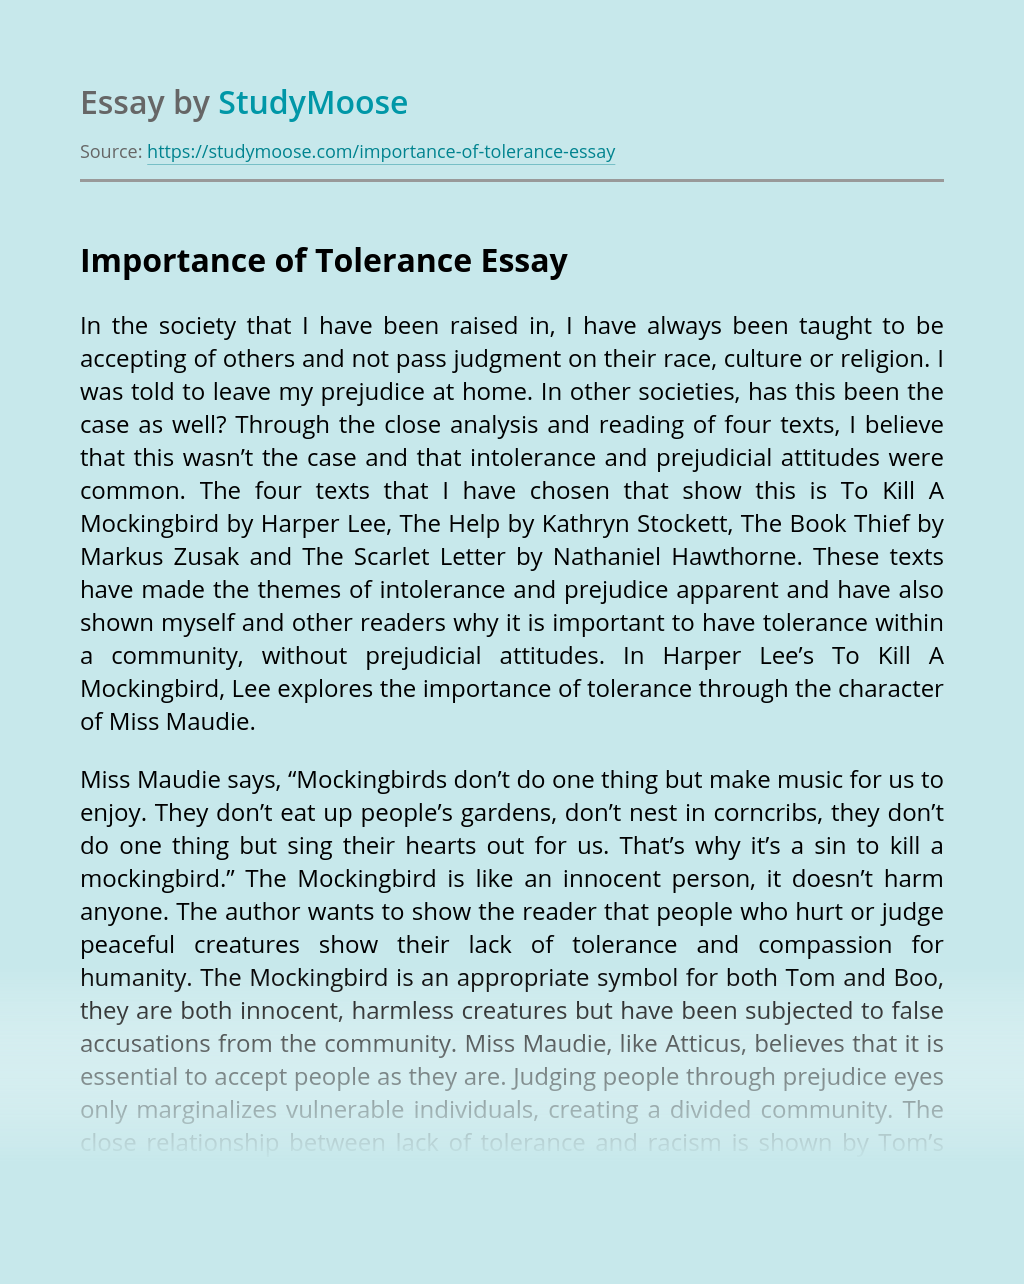 Importance of Tolerance